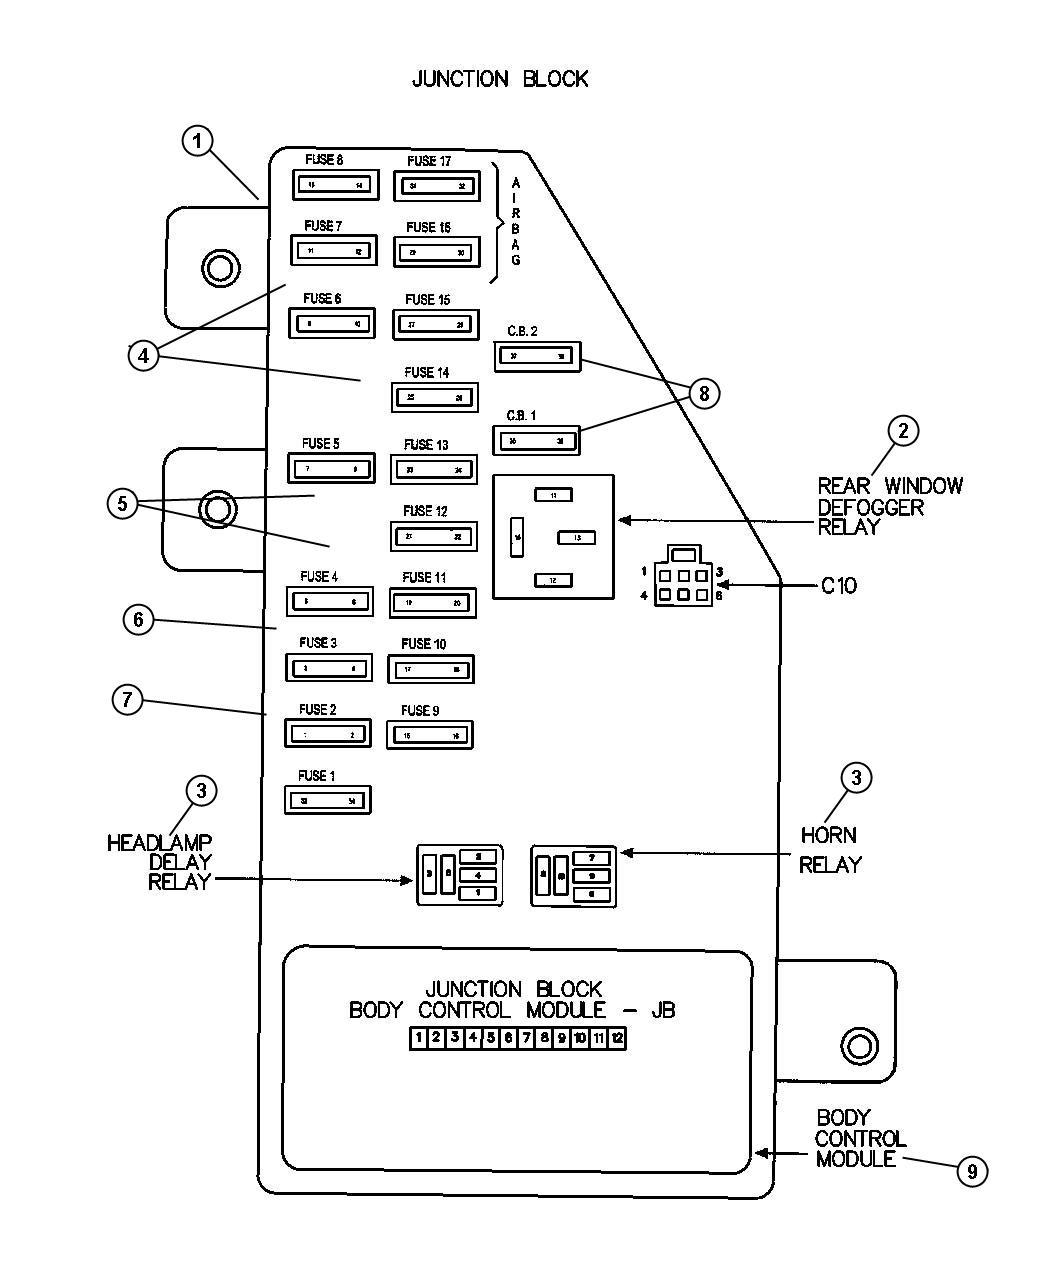 hight resolution of chrysler sebring fuel pump change chrysler free engine 1999 chrysler sebring ignition wiring diagram 1999 chrysler